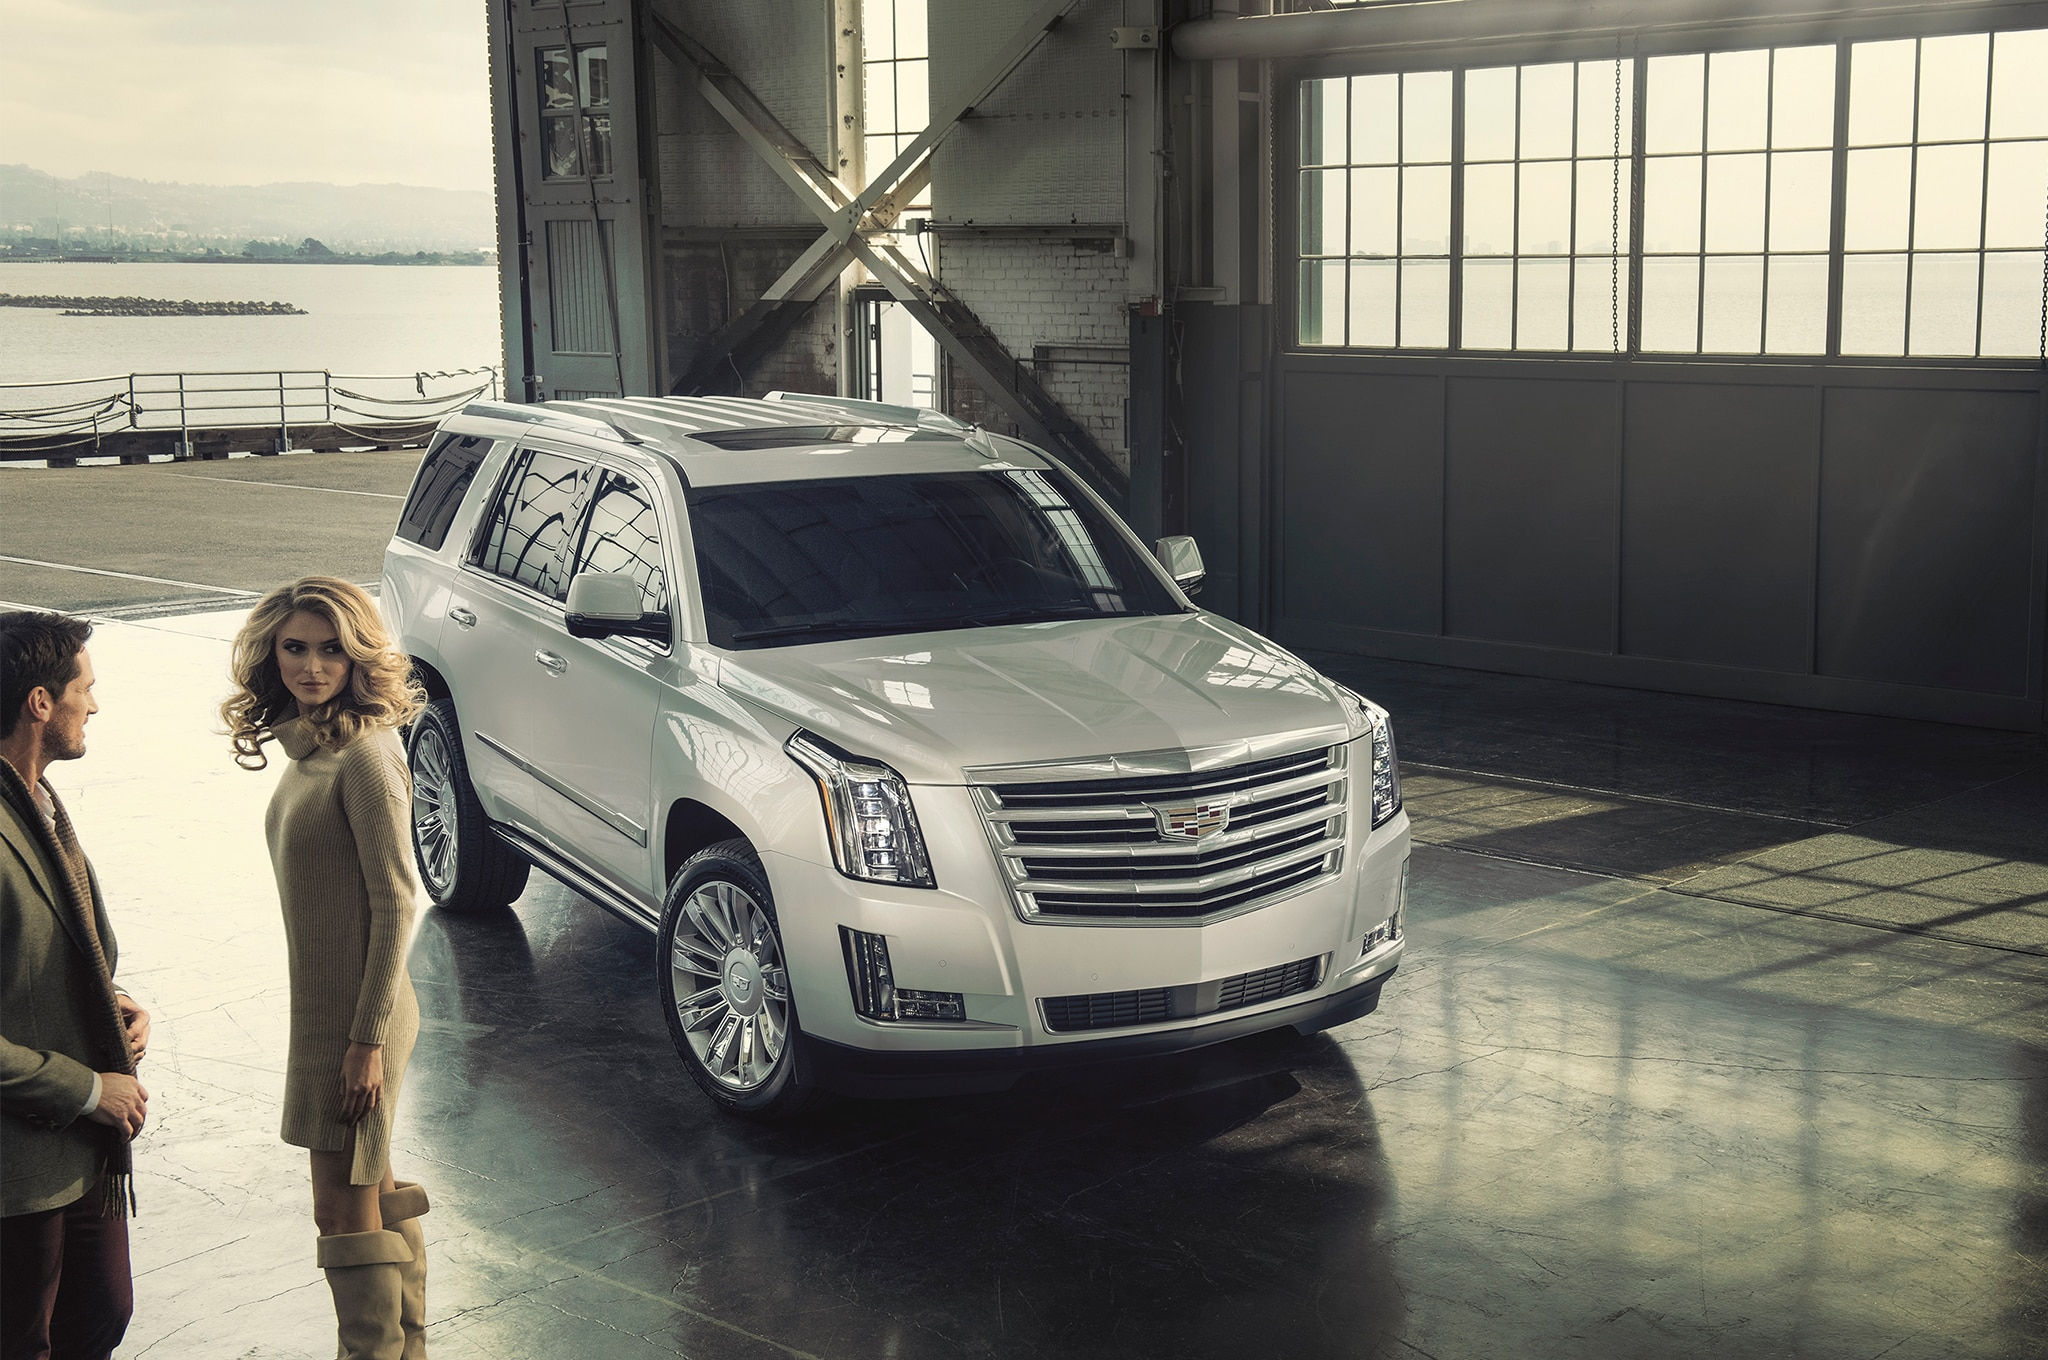 2020 Cadillac Escalade and Escalade ESV: What to Expect ...